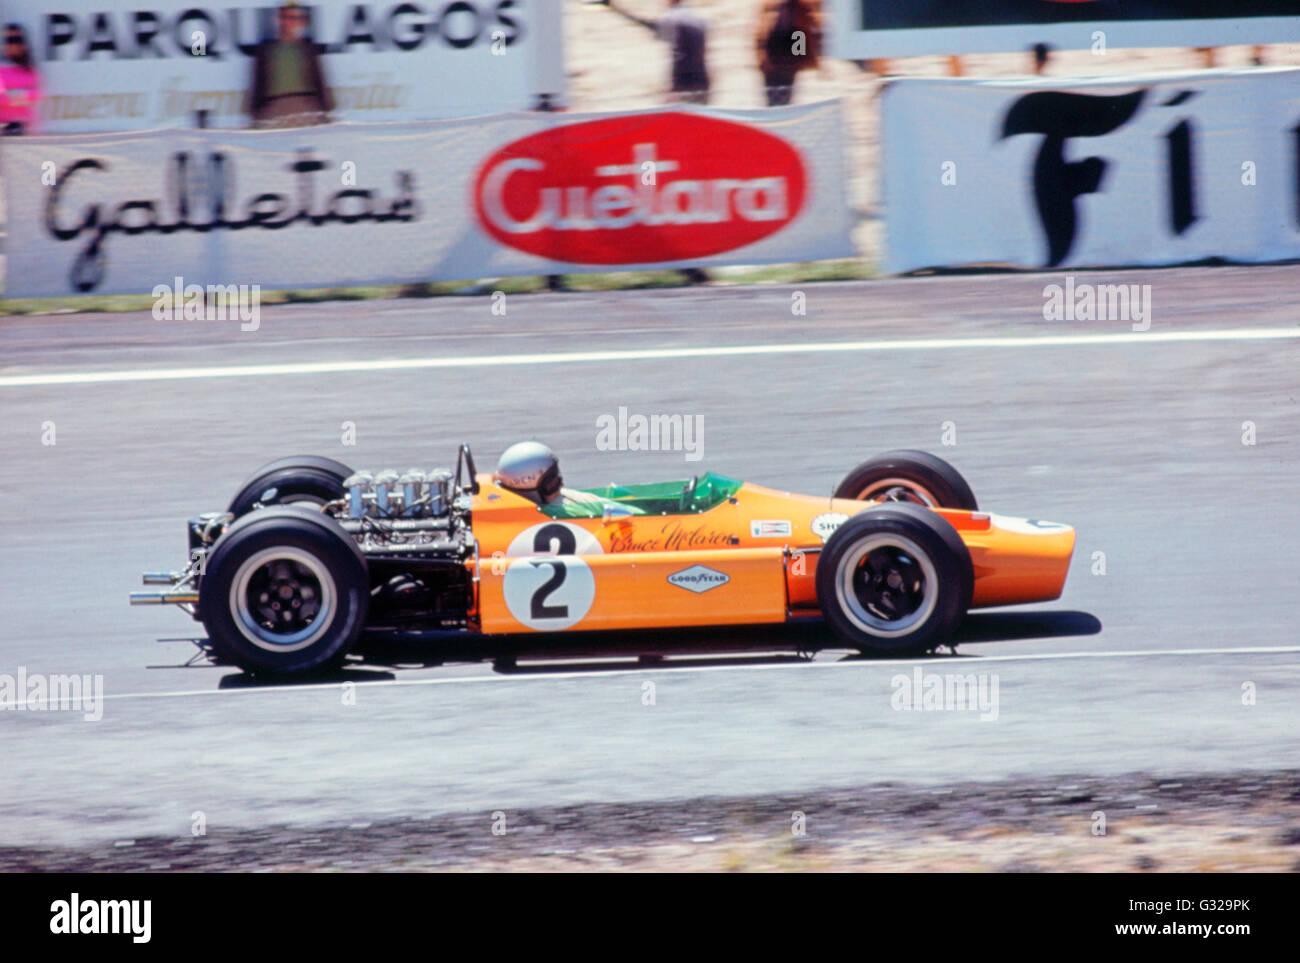 McLaren Ford, Bruce McLaren 1968 Dutch Grand Prix - Stock Image